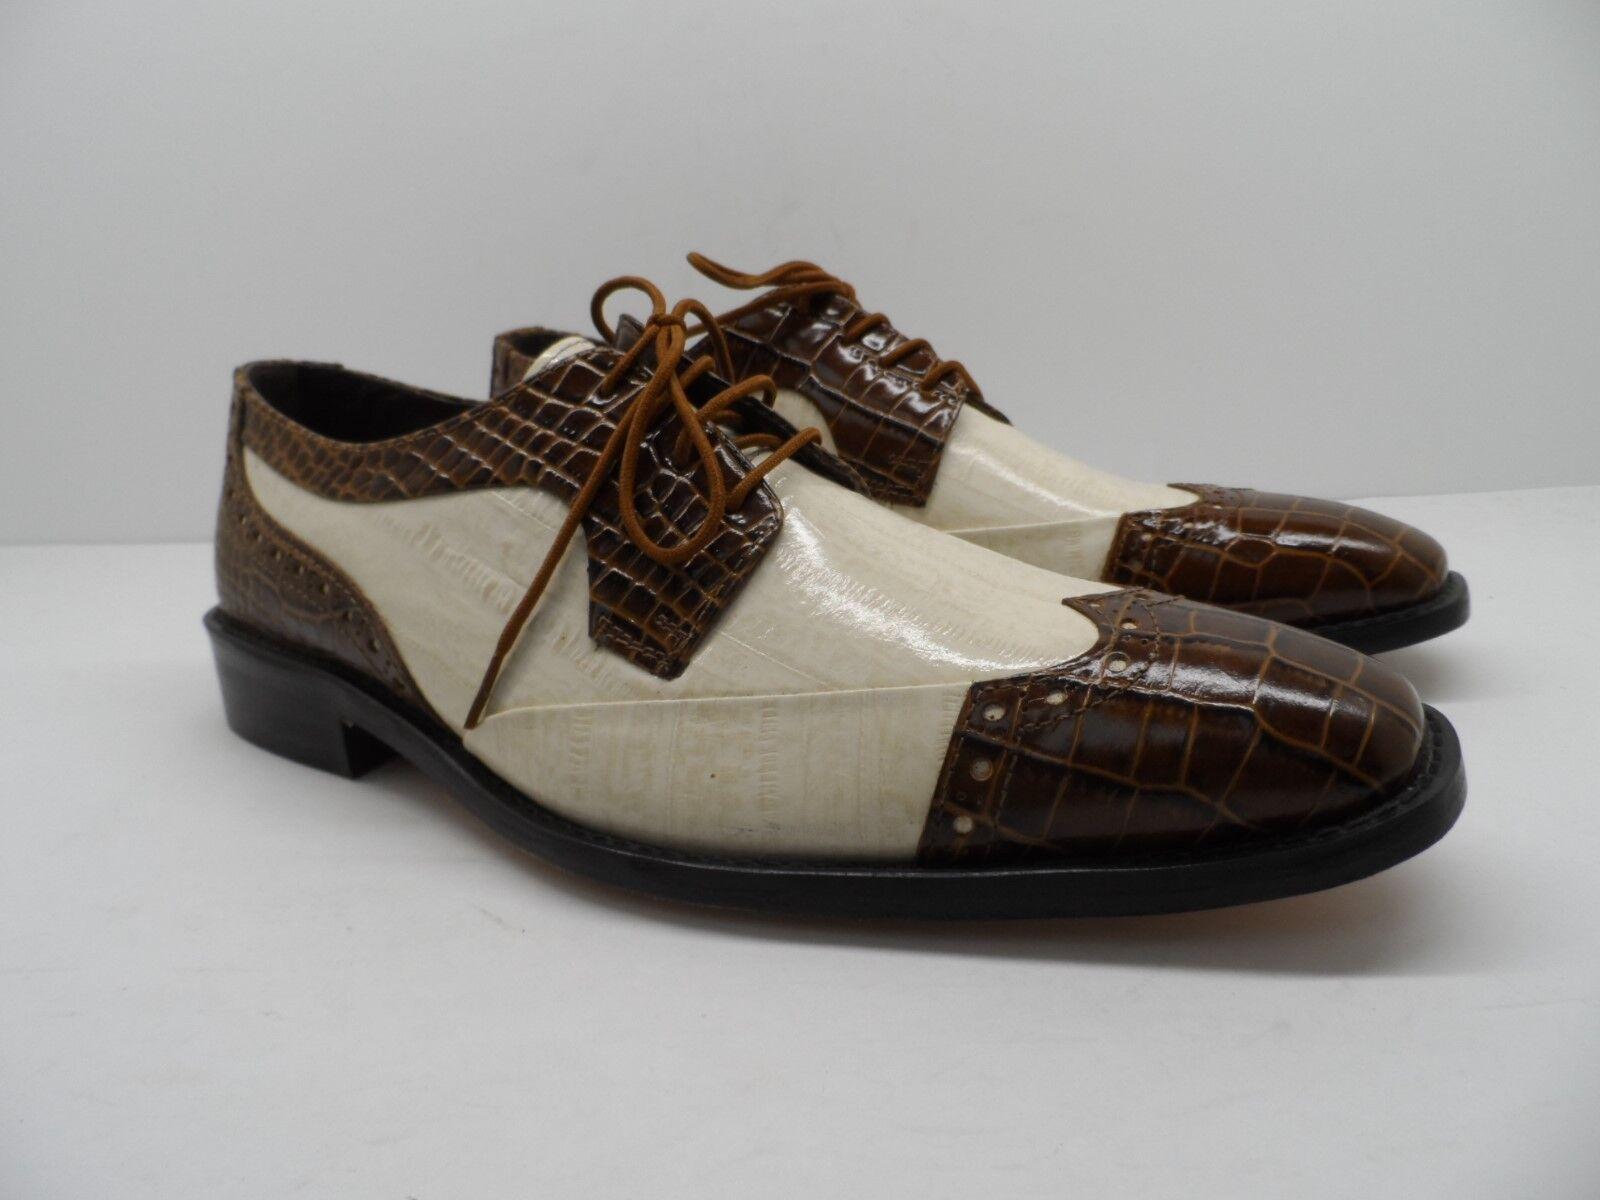 Stacy Adams Men's Galletti Crocodile Print Dress shoes Oxford Size 8M